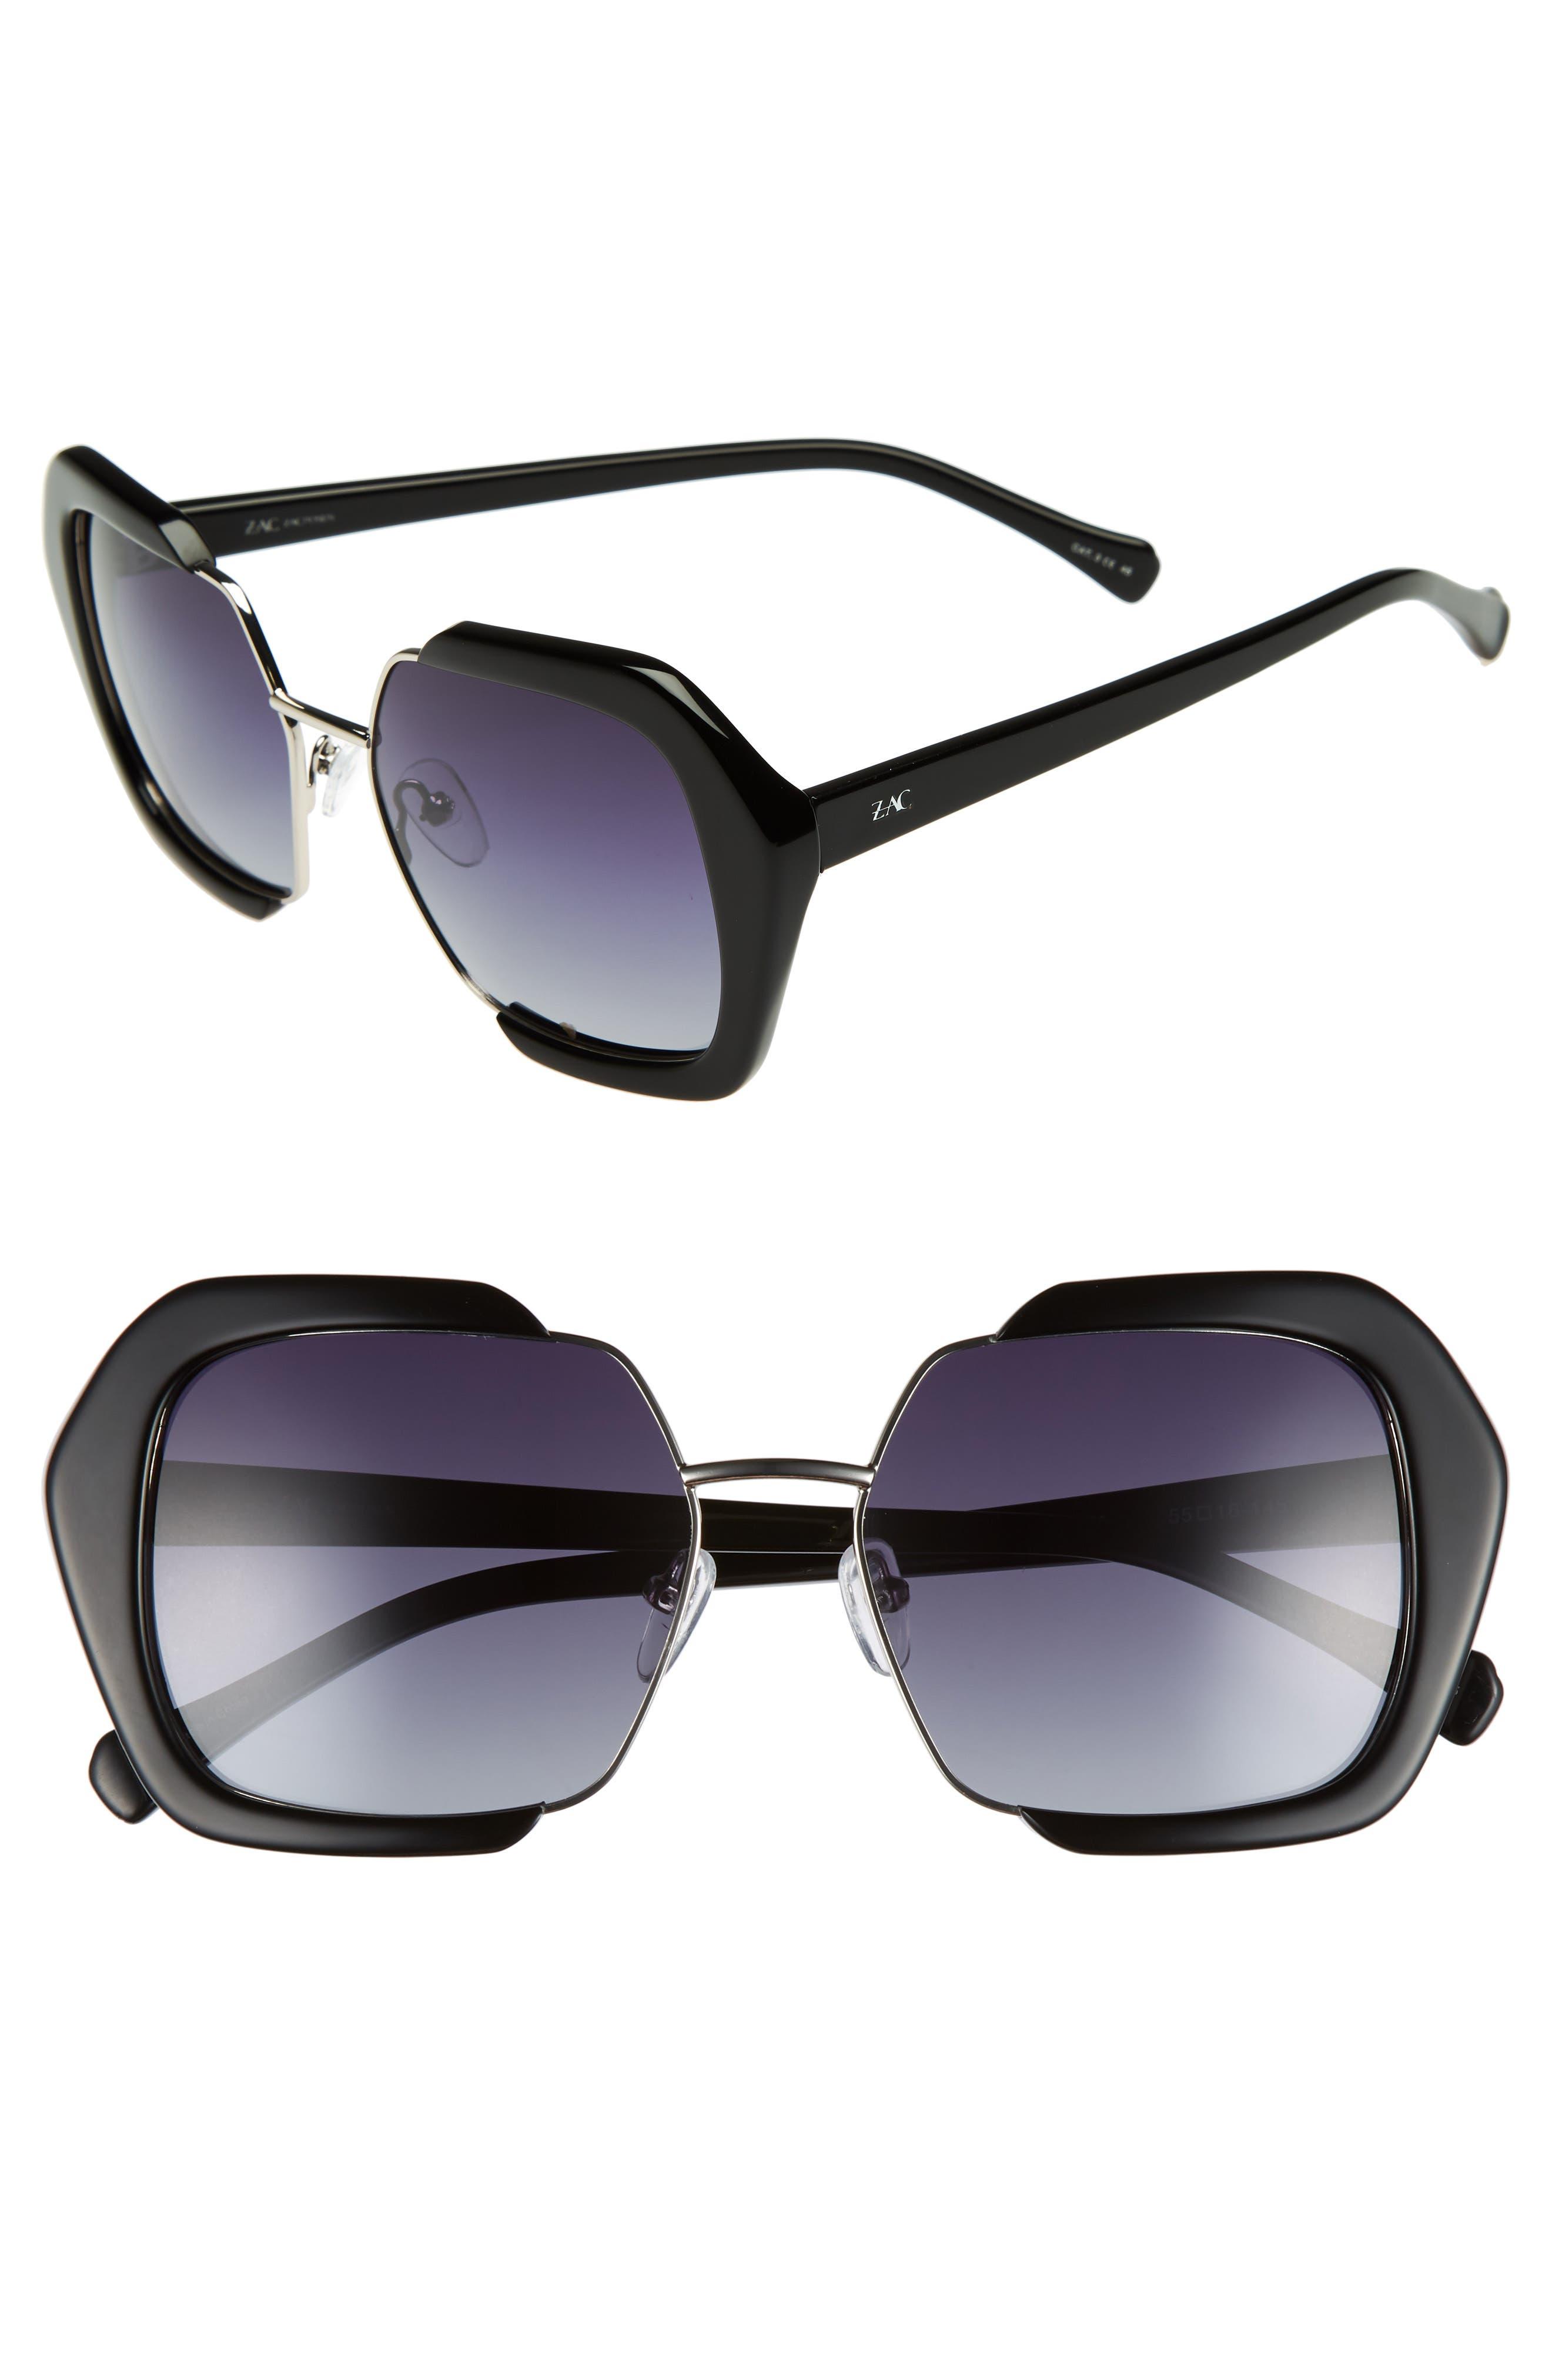 Isleen 55mm Polarized Sunglasses,                             Main thumbnail 1, color,                             BLACK POLAR